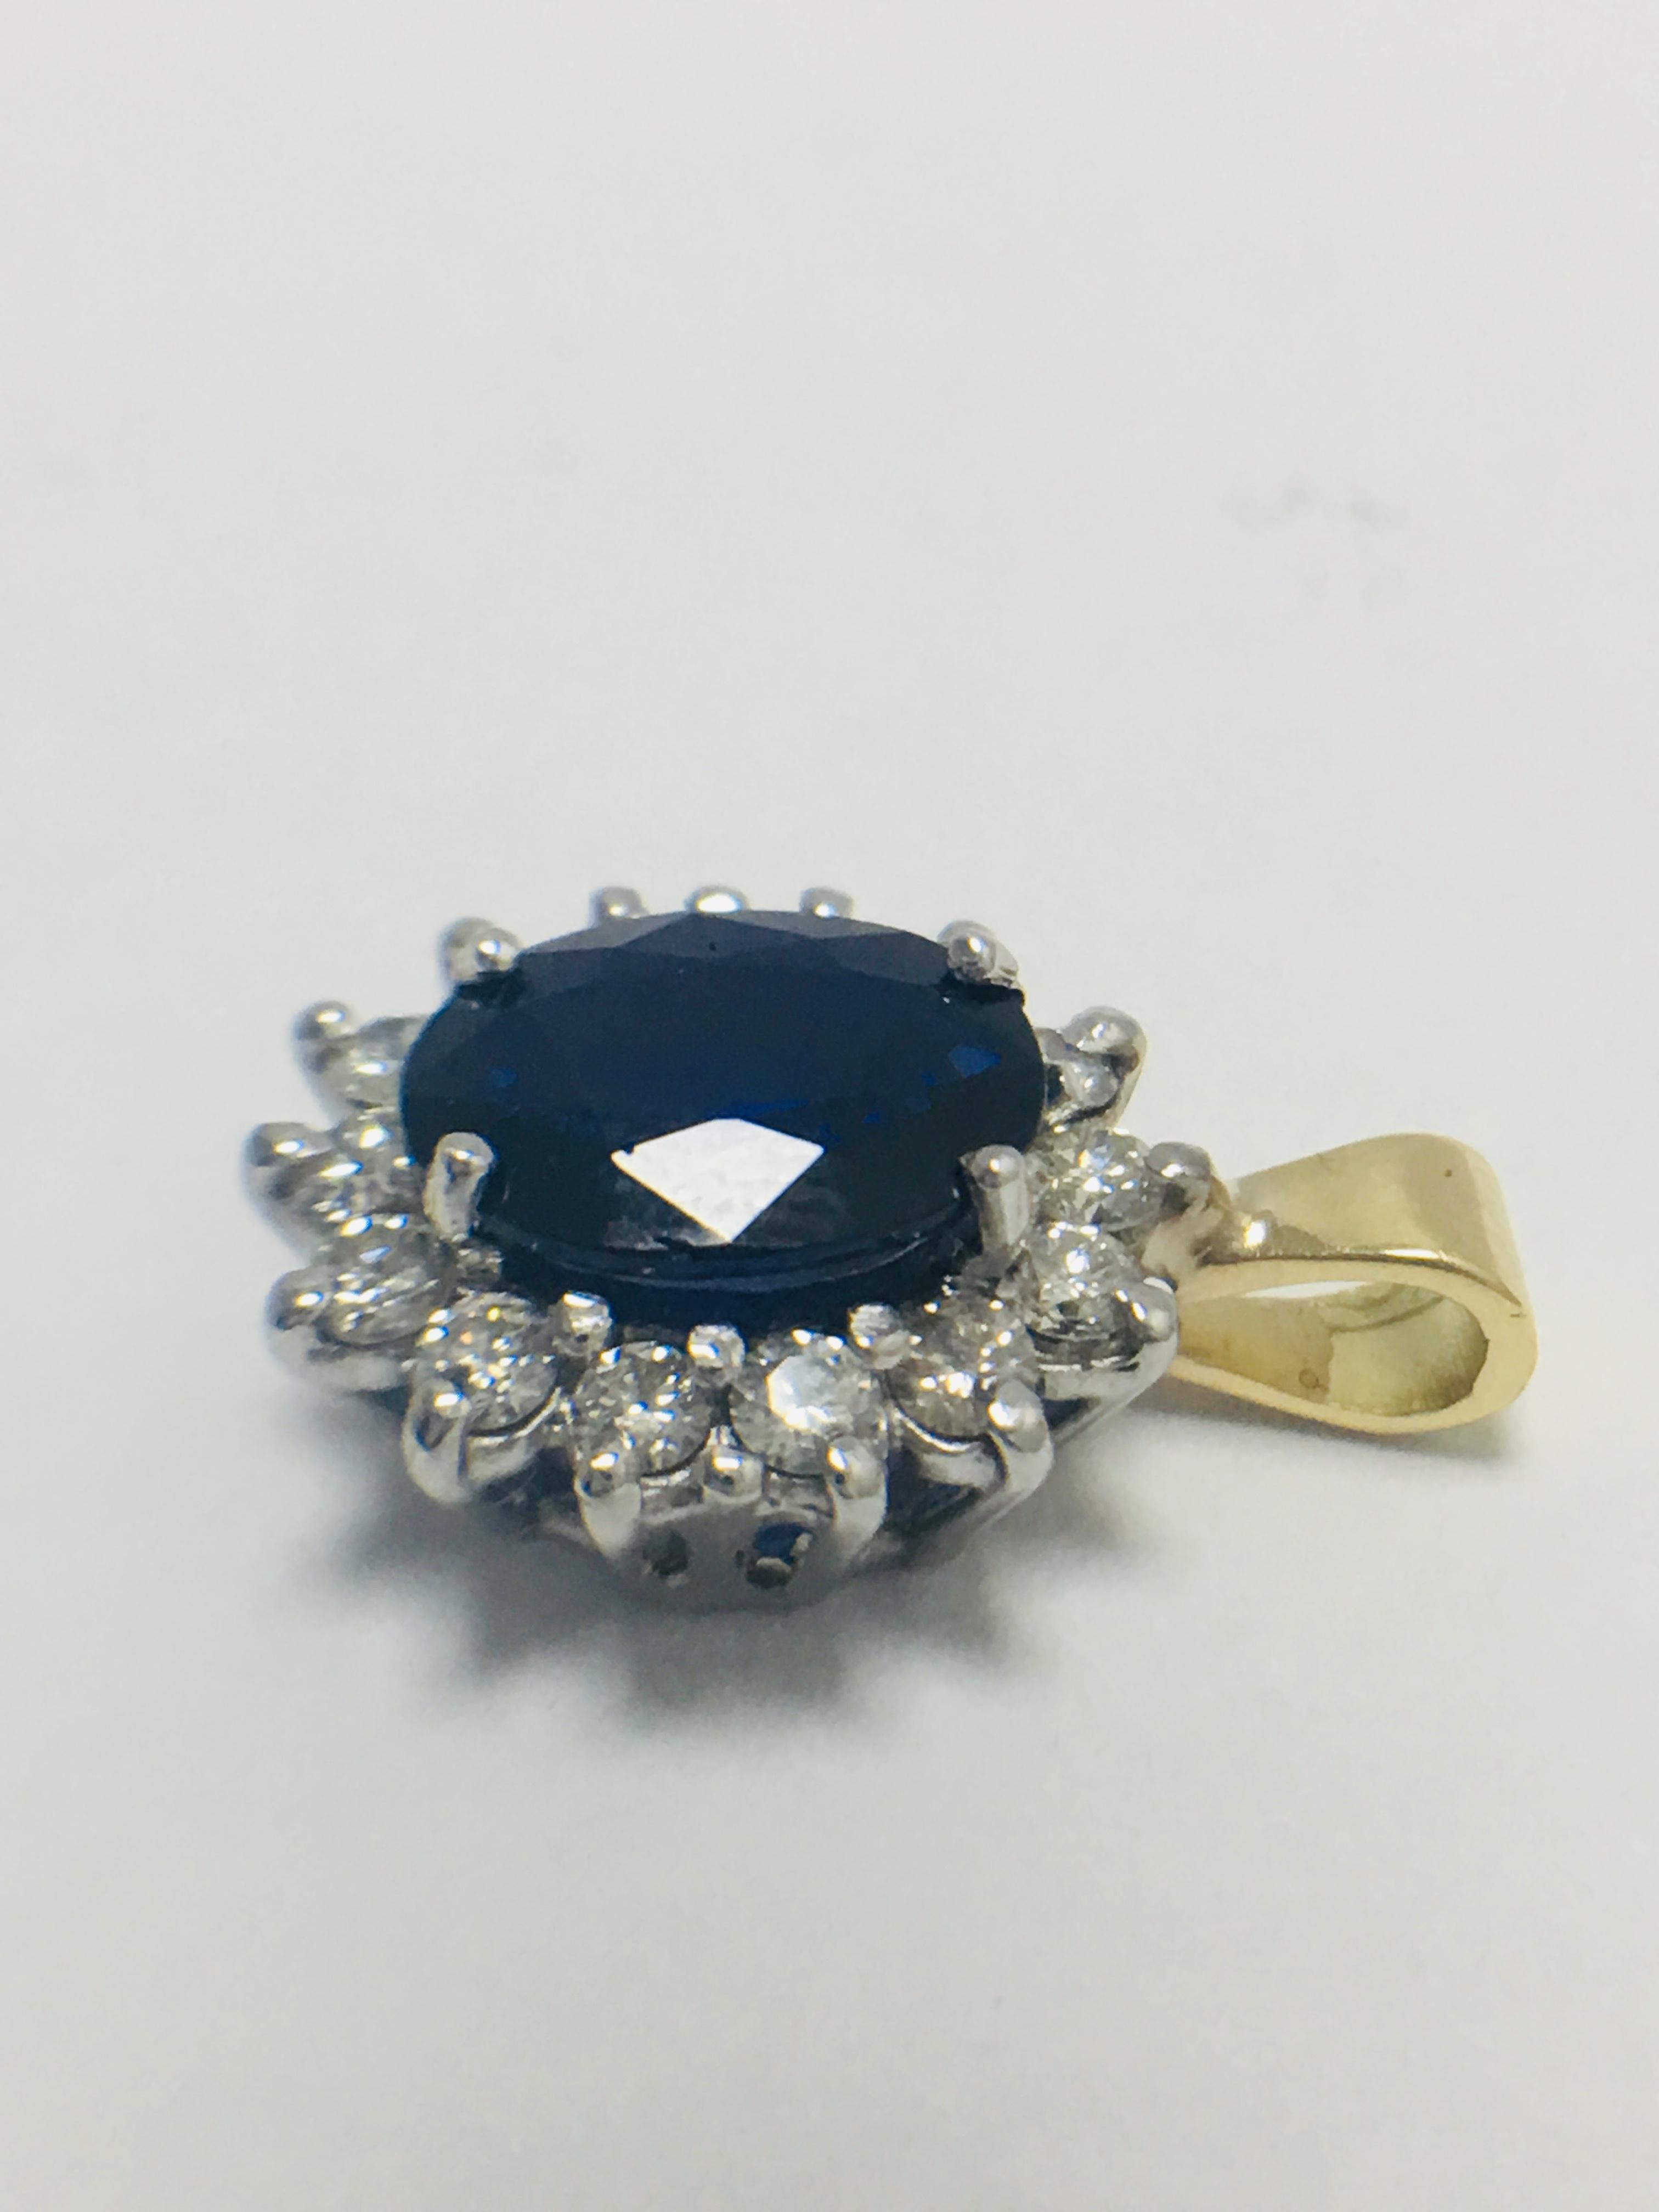 Lot 29 - Sapphire and Diamond Pendant,18ct Gold